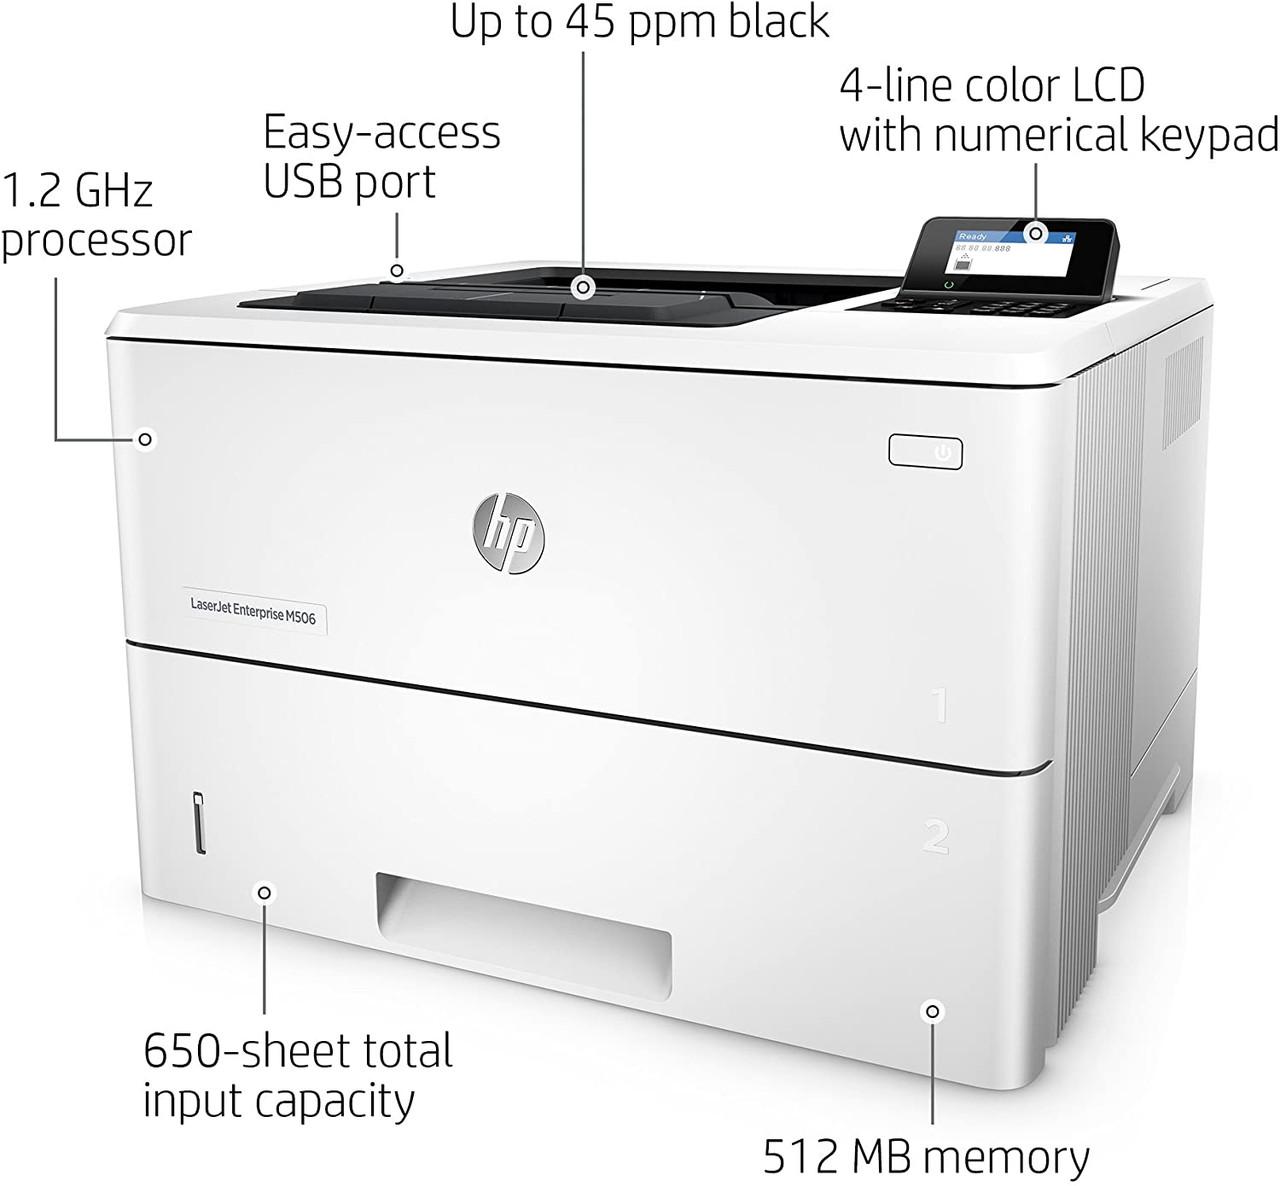 HP LaserJet Enterprise M507dn Mono Laser Printer features